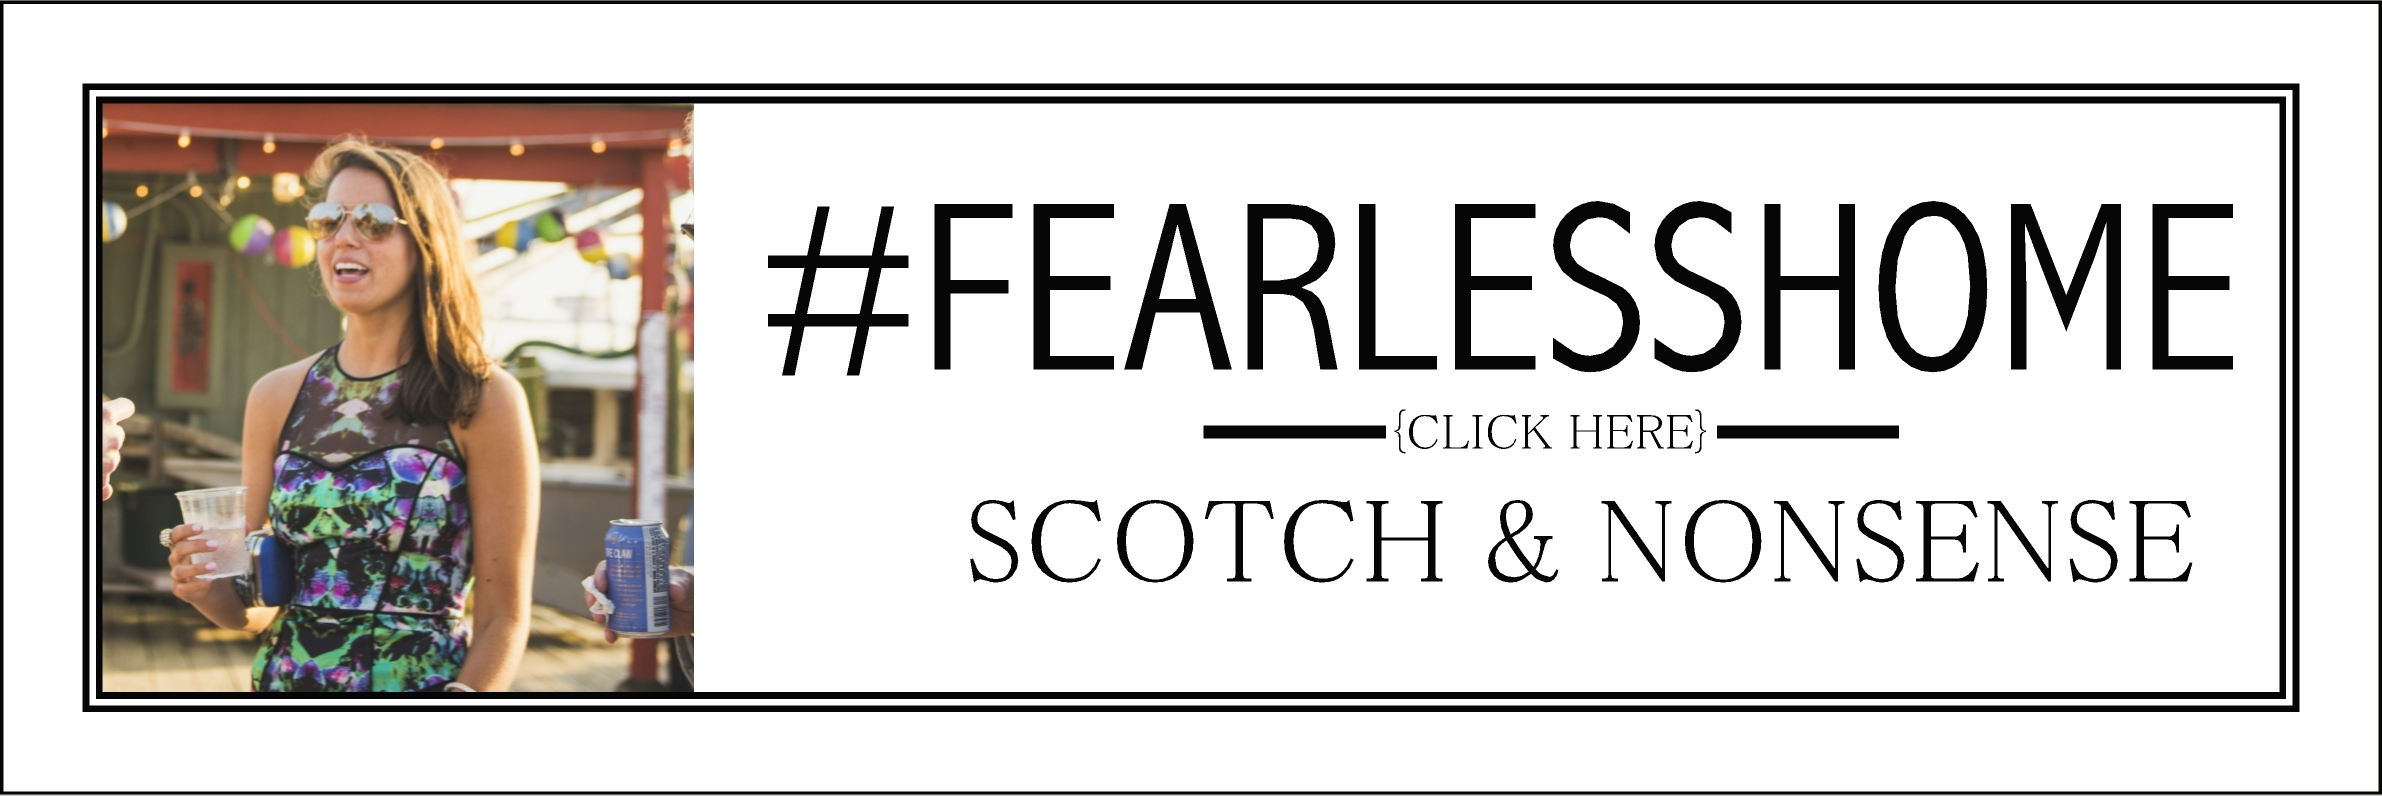 Fearless Home: Scotch & Nonsense